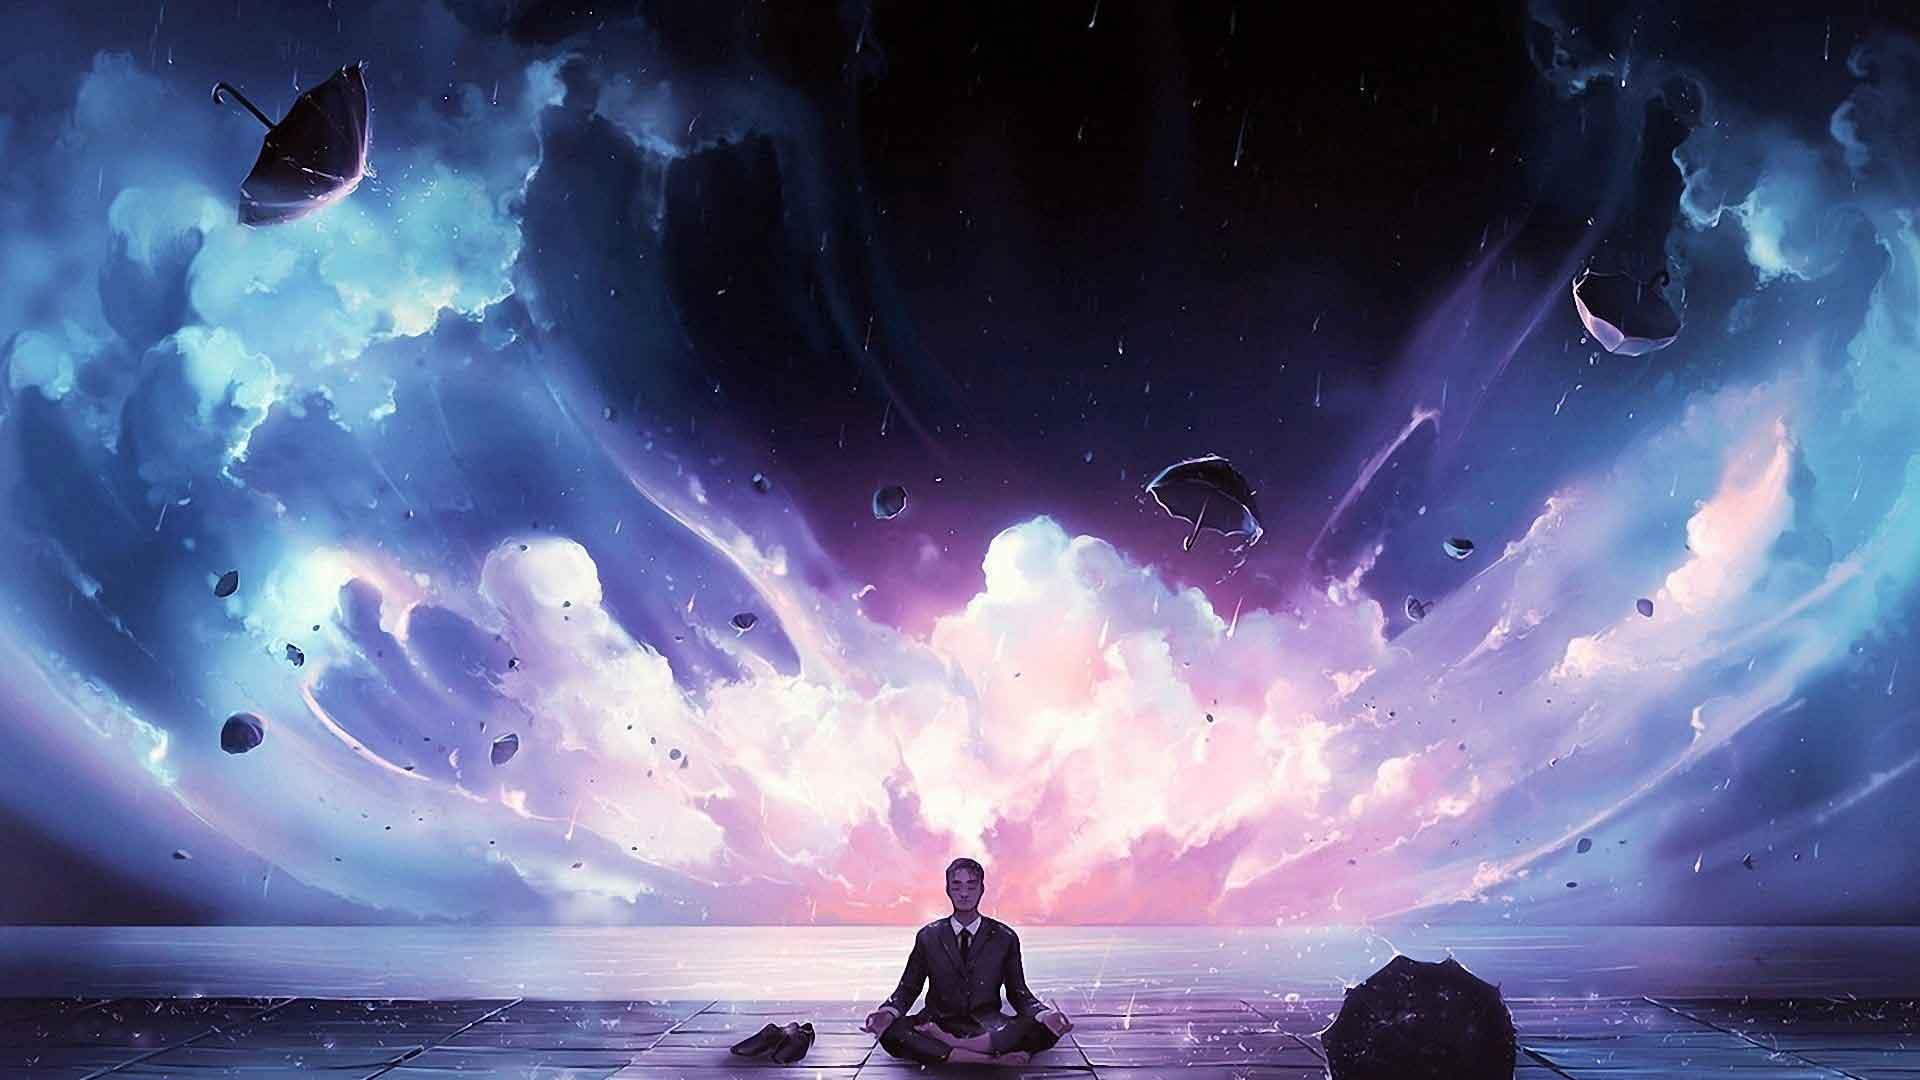 Parapsikoloji Meditasyon 2